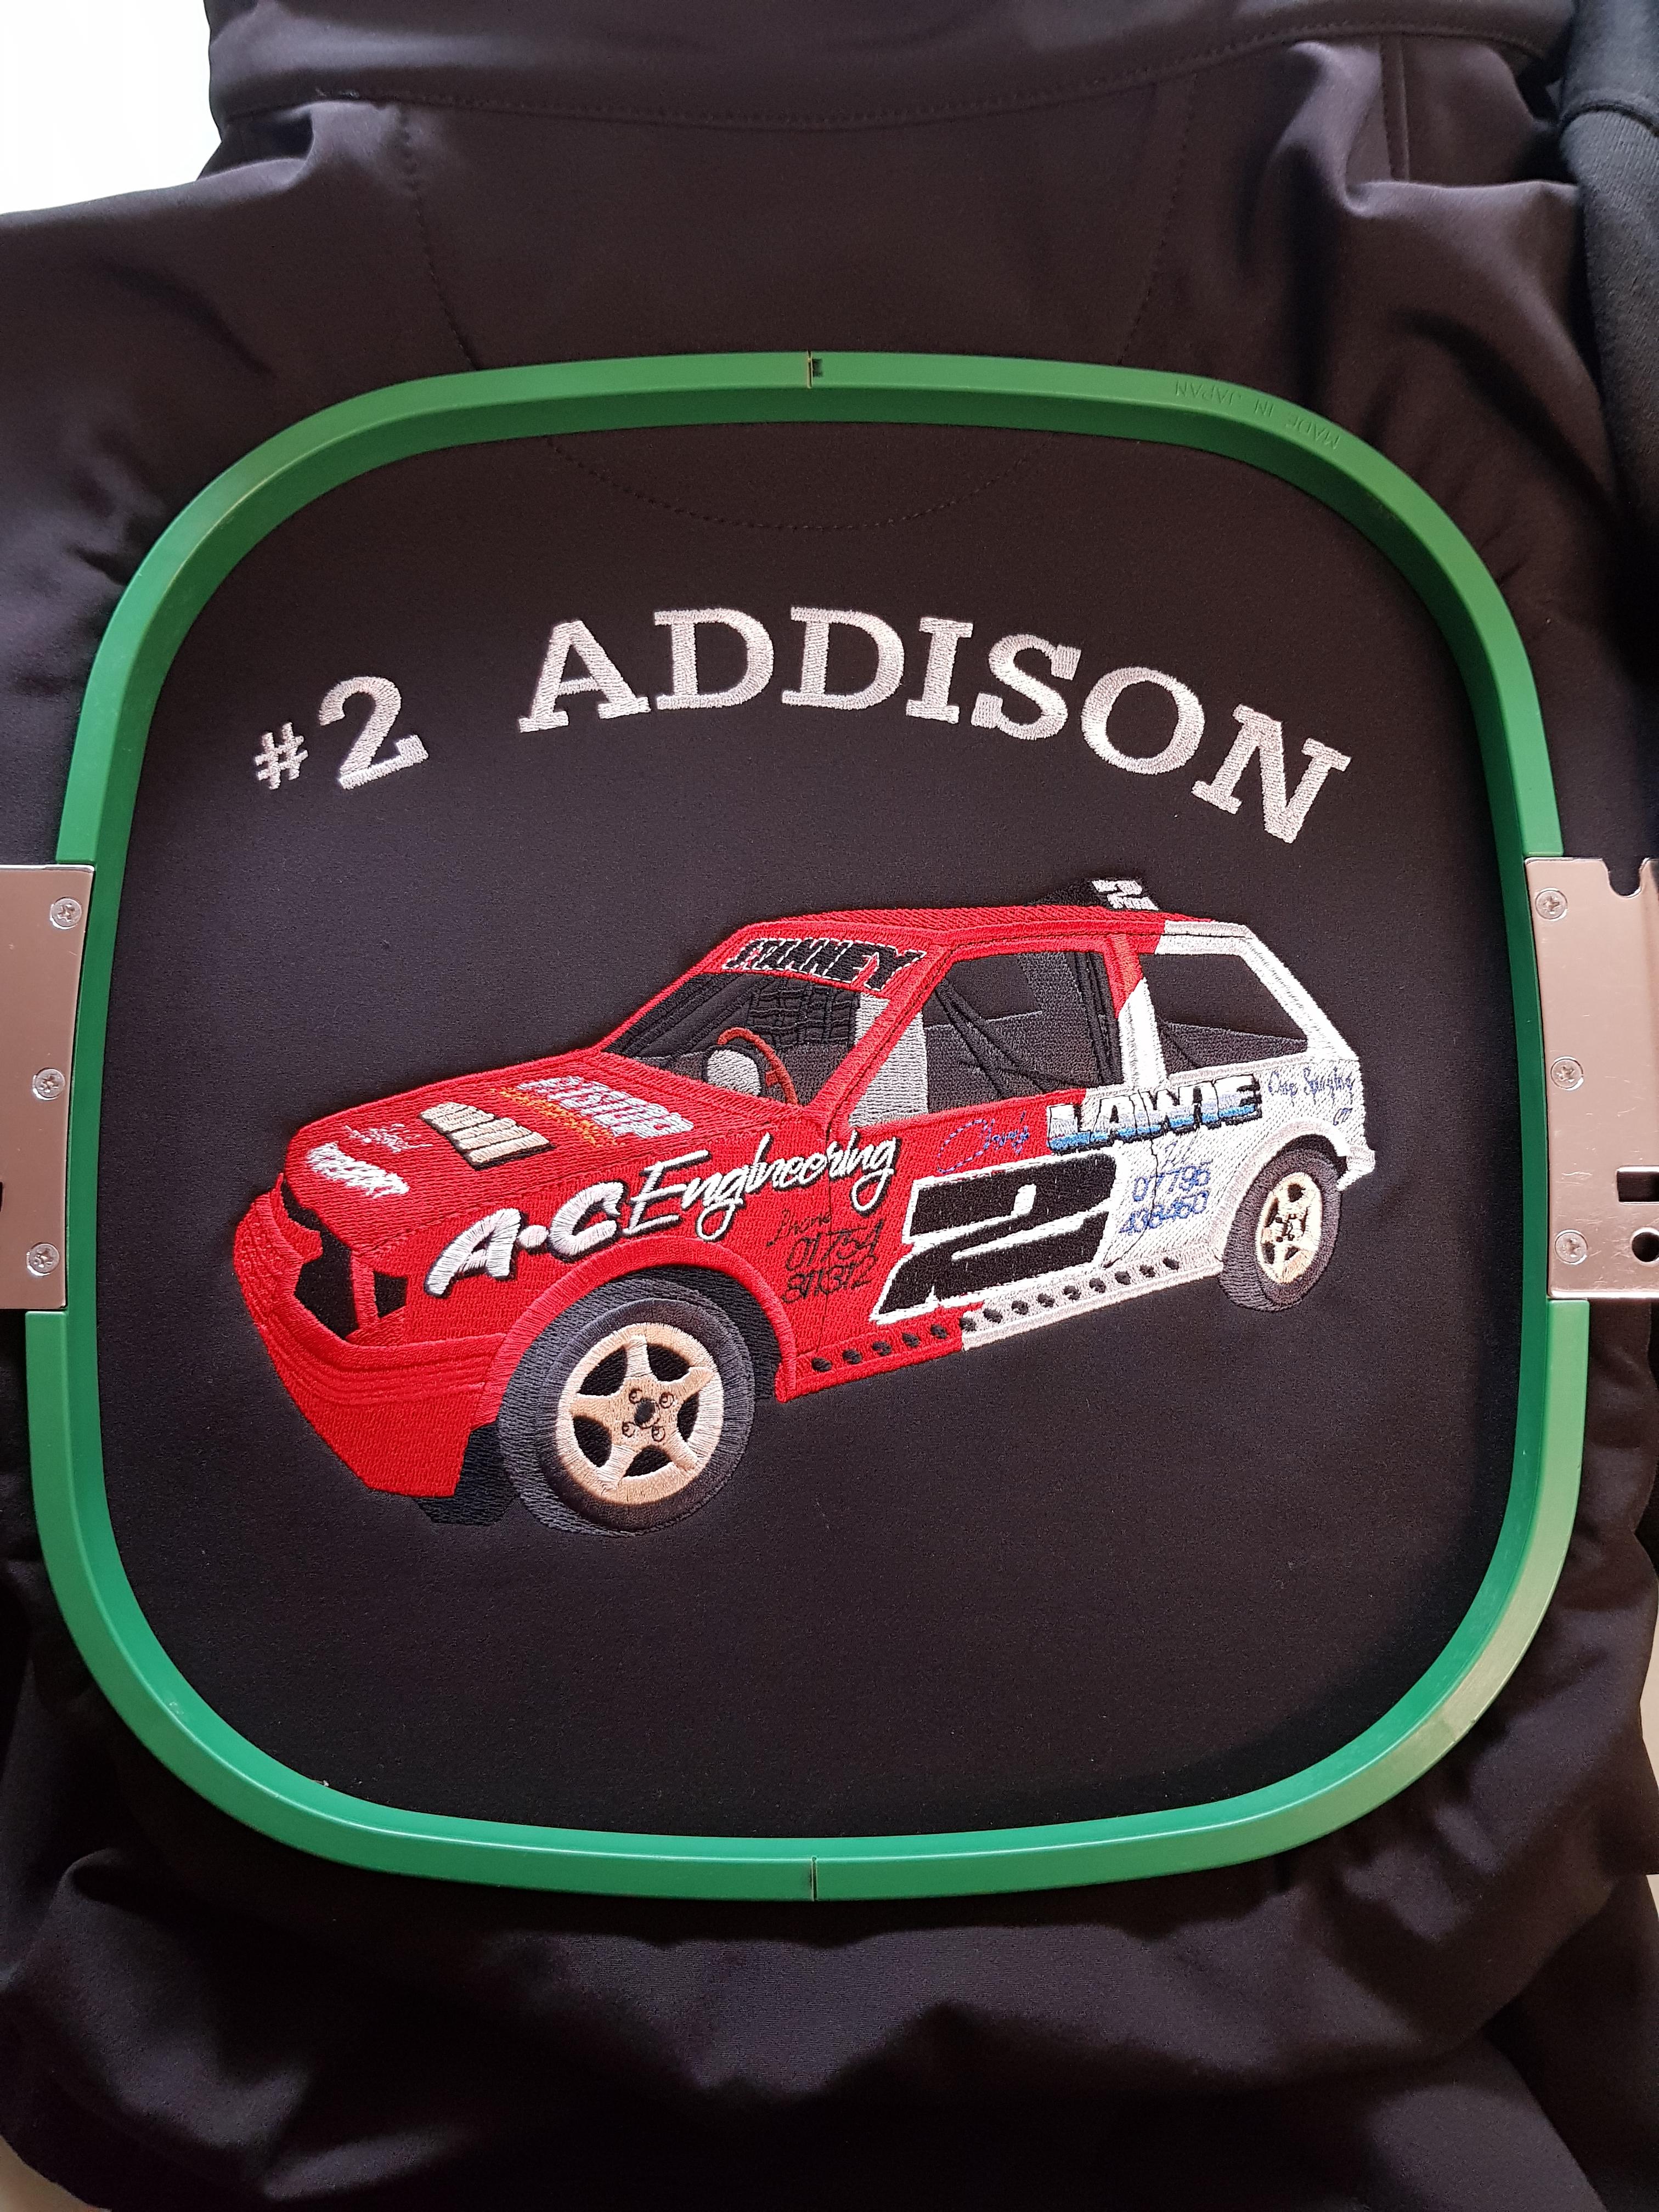 Addison racing car